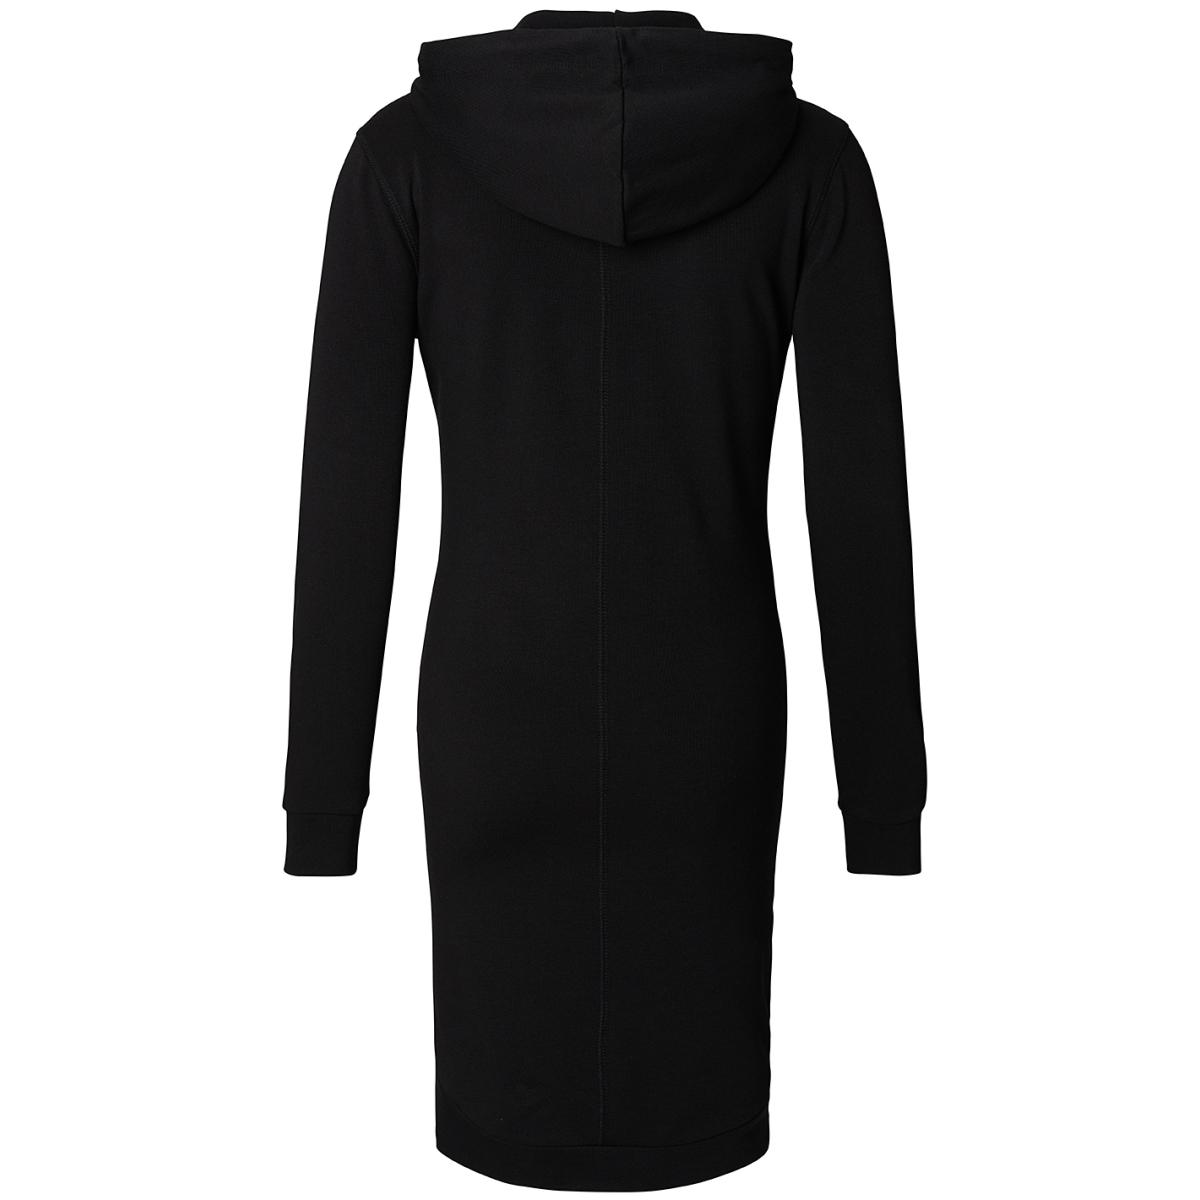 s0613 dress sweat supermom positie jurk black